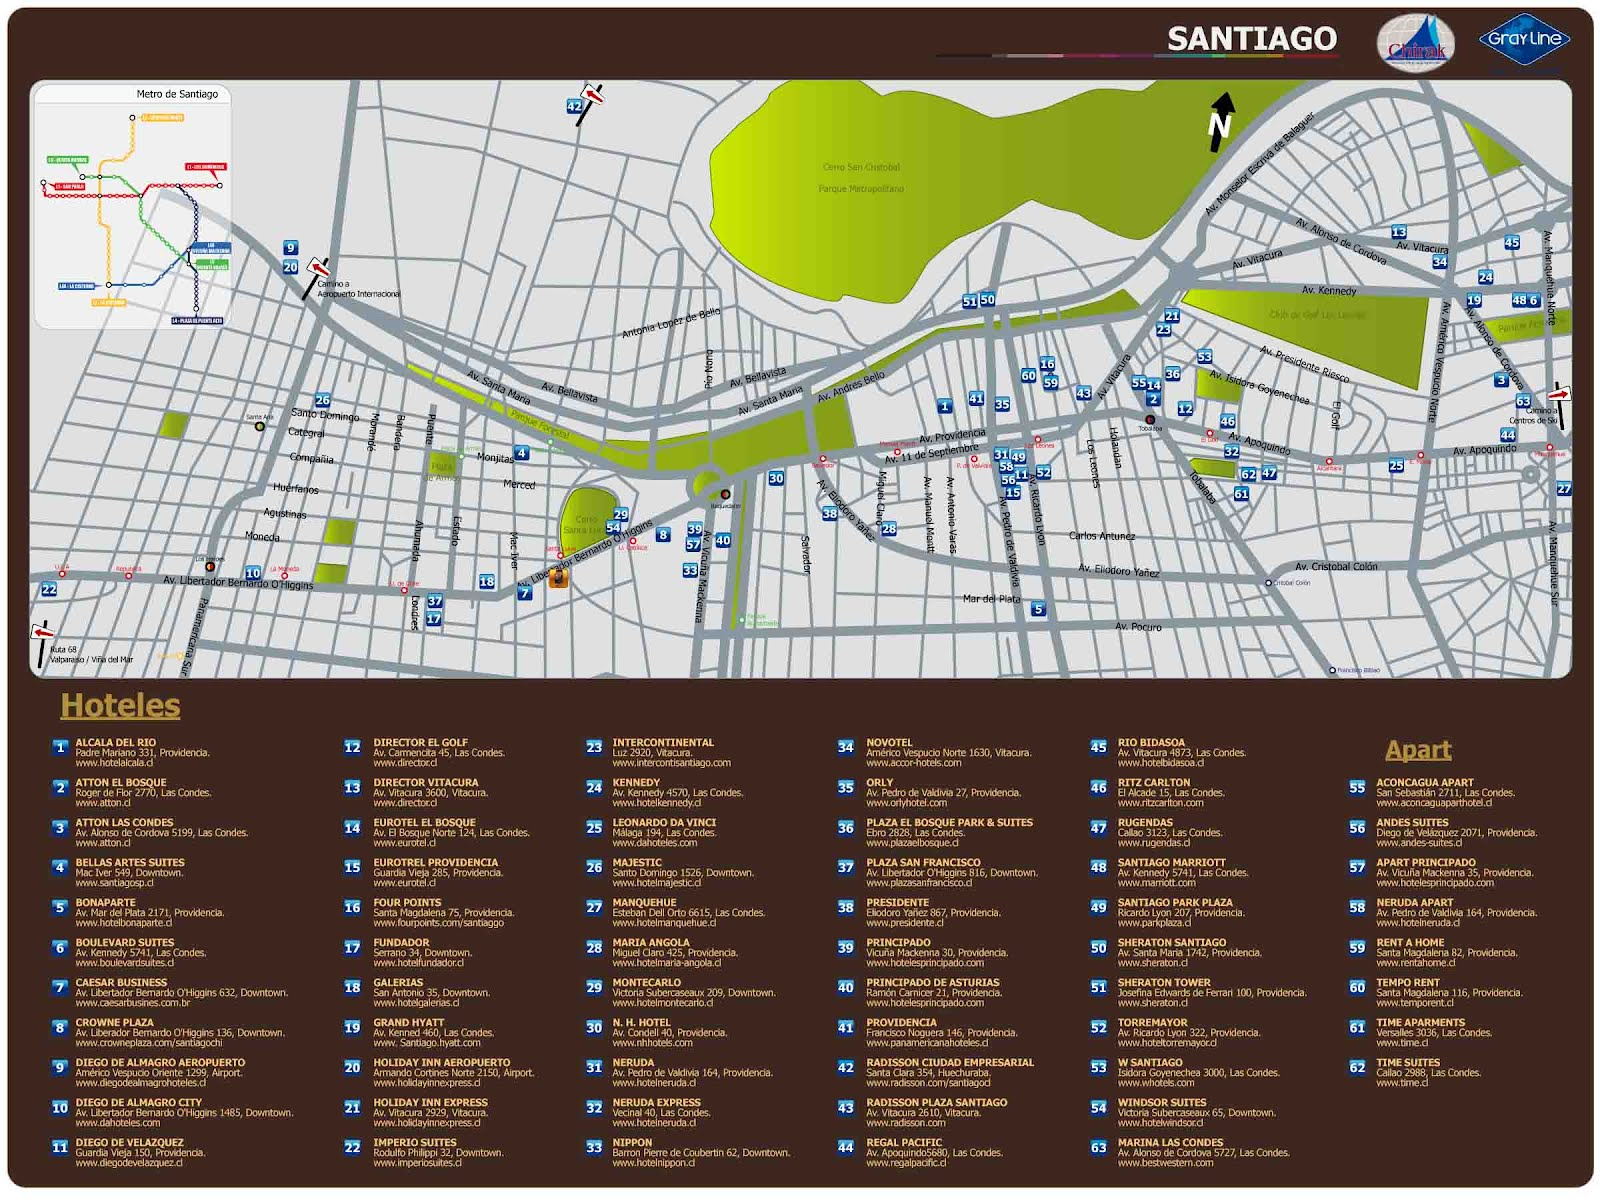 Santiago do chile mapa turistico for Mapa de santiago de chile